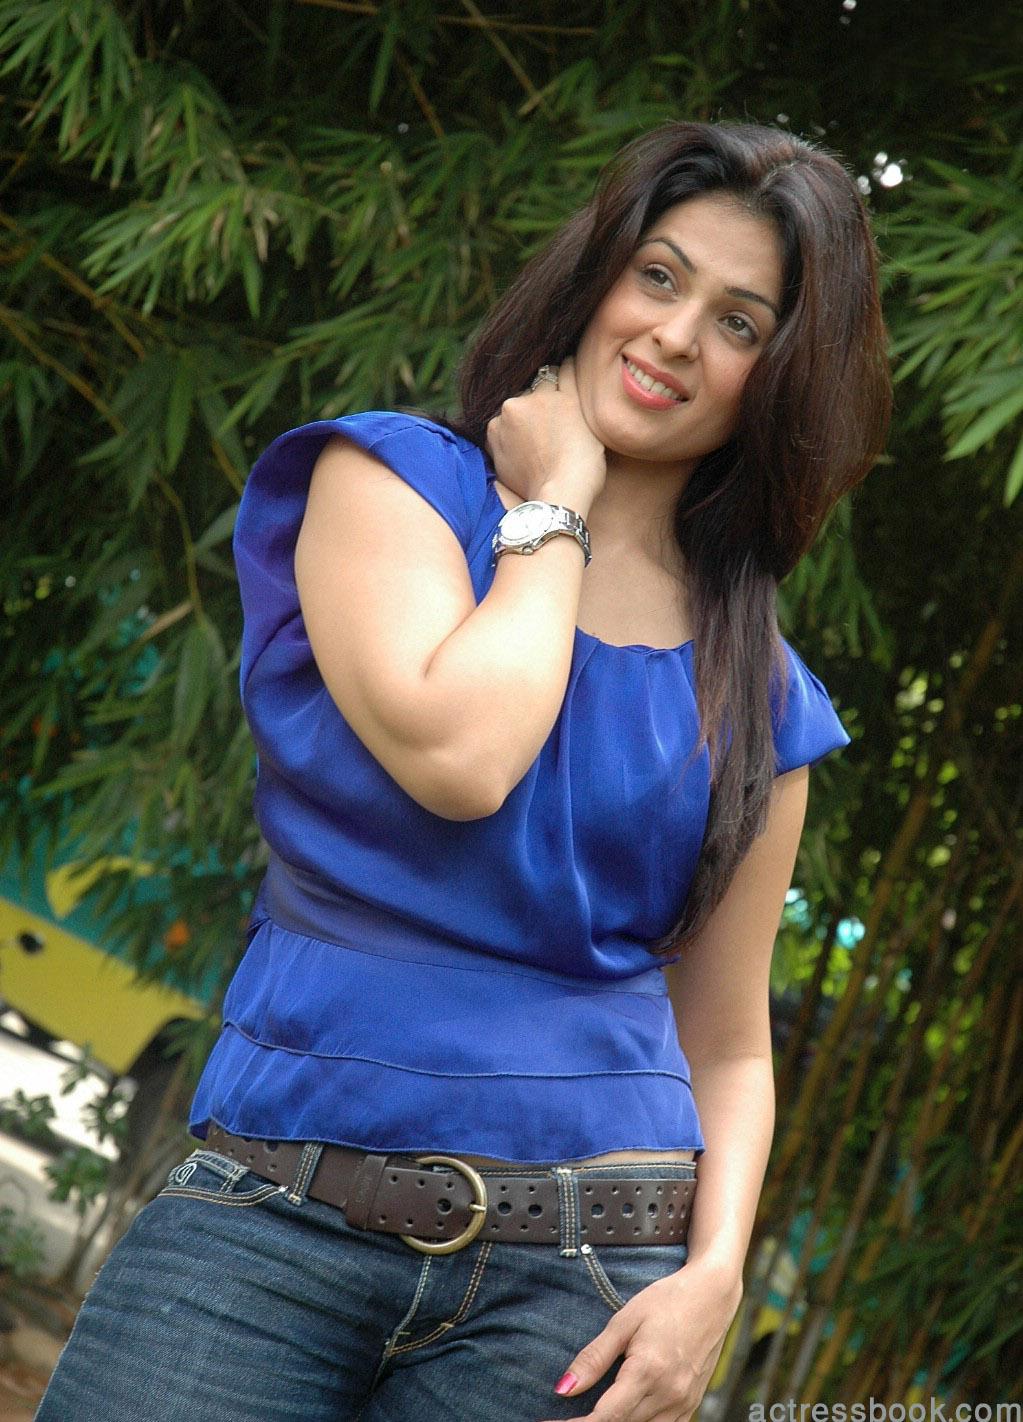 Bollywood Girl Wallpaper Sexy Girl Bikini New Bollywood Hot Actress Anjana Sukhani